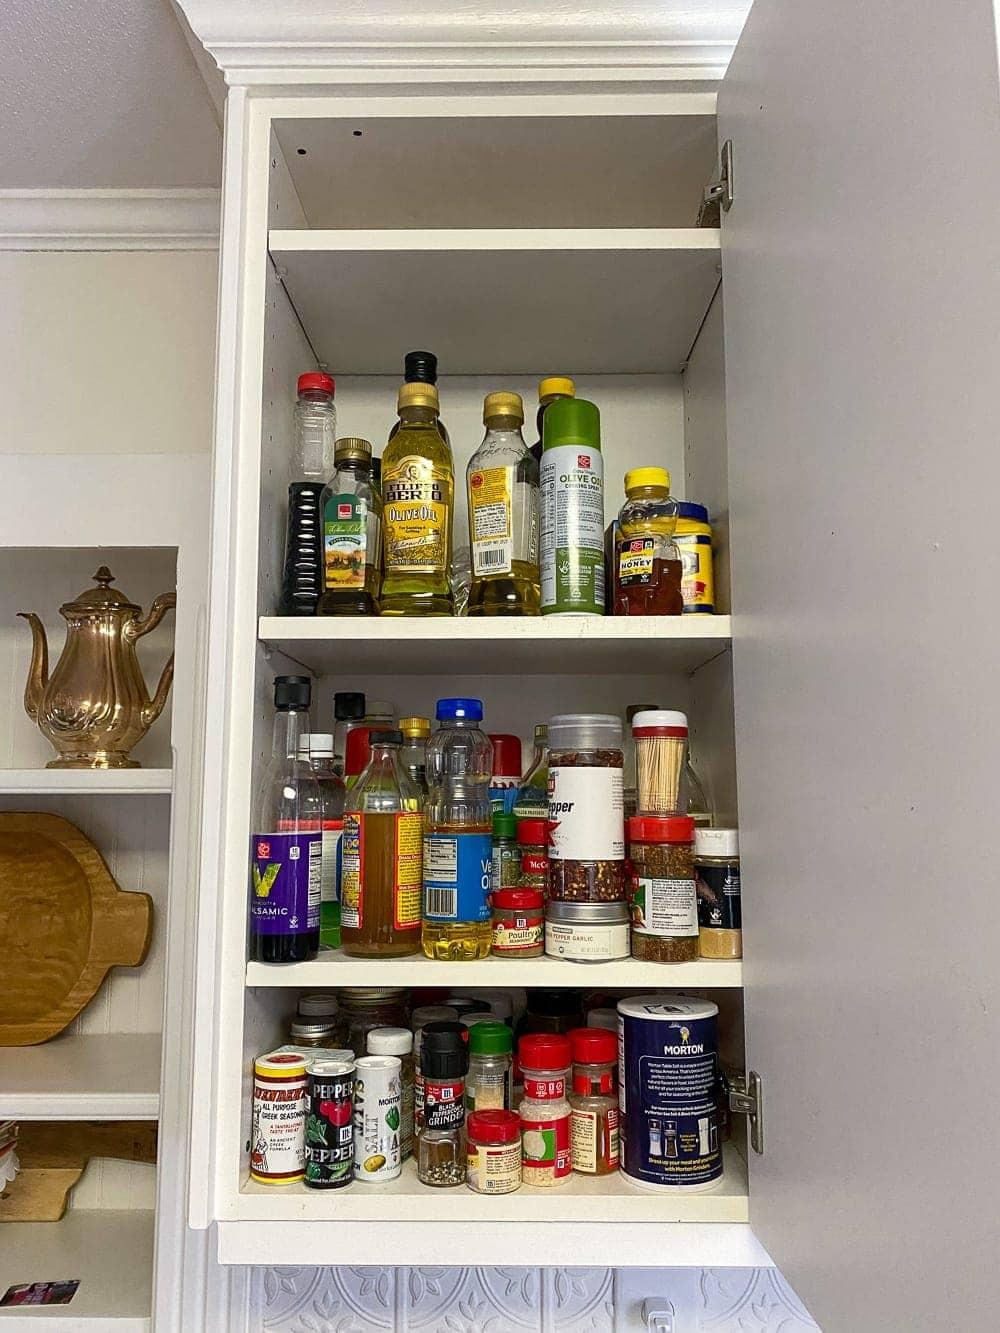 Kitchen Organization Makeover | Spice Cabinet Before